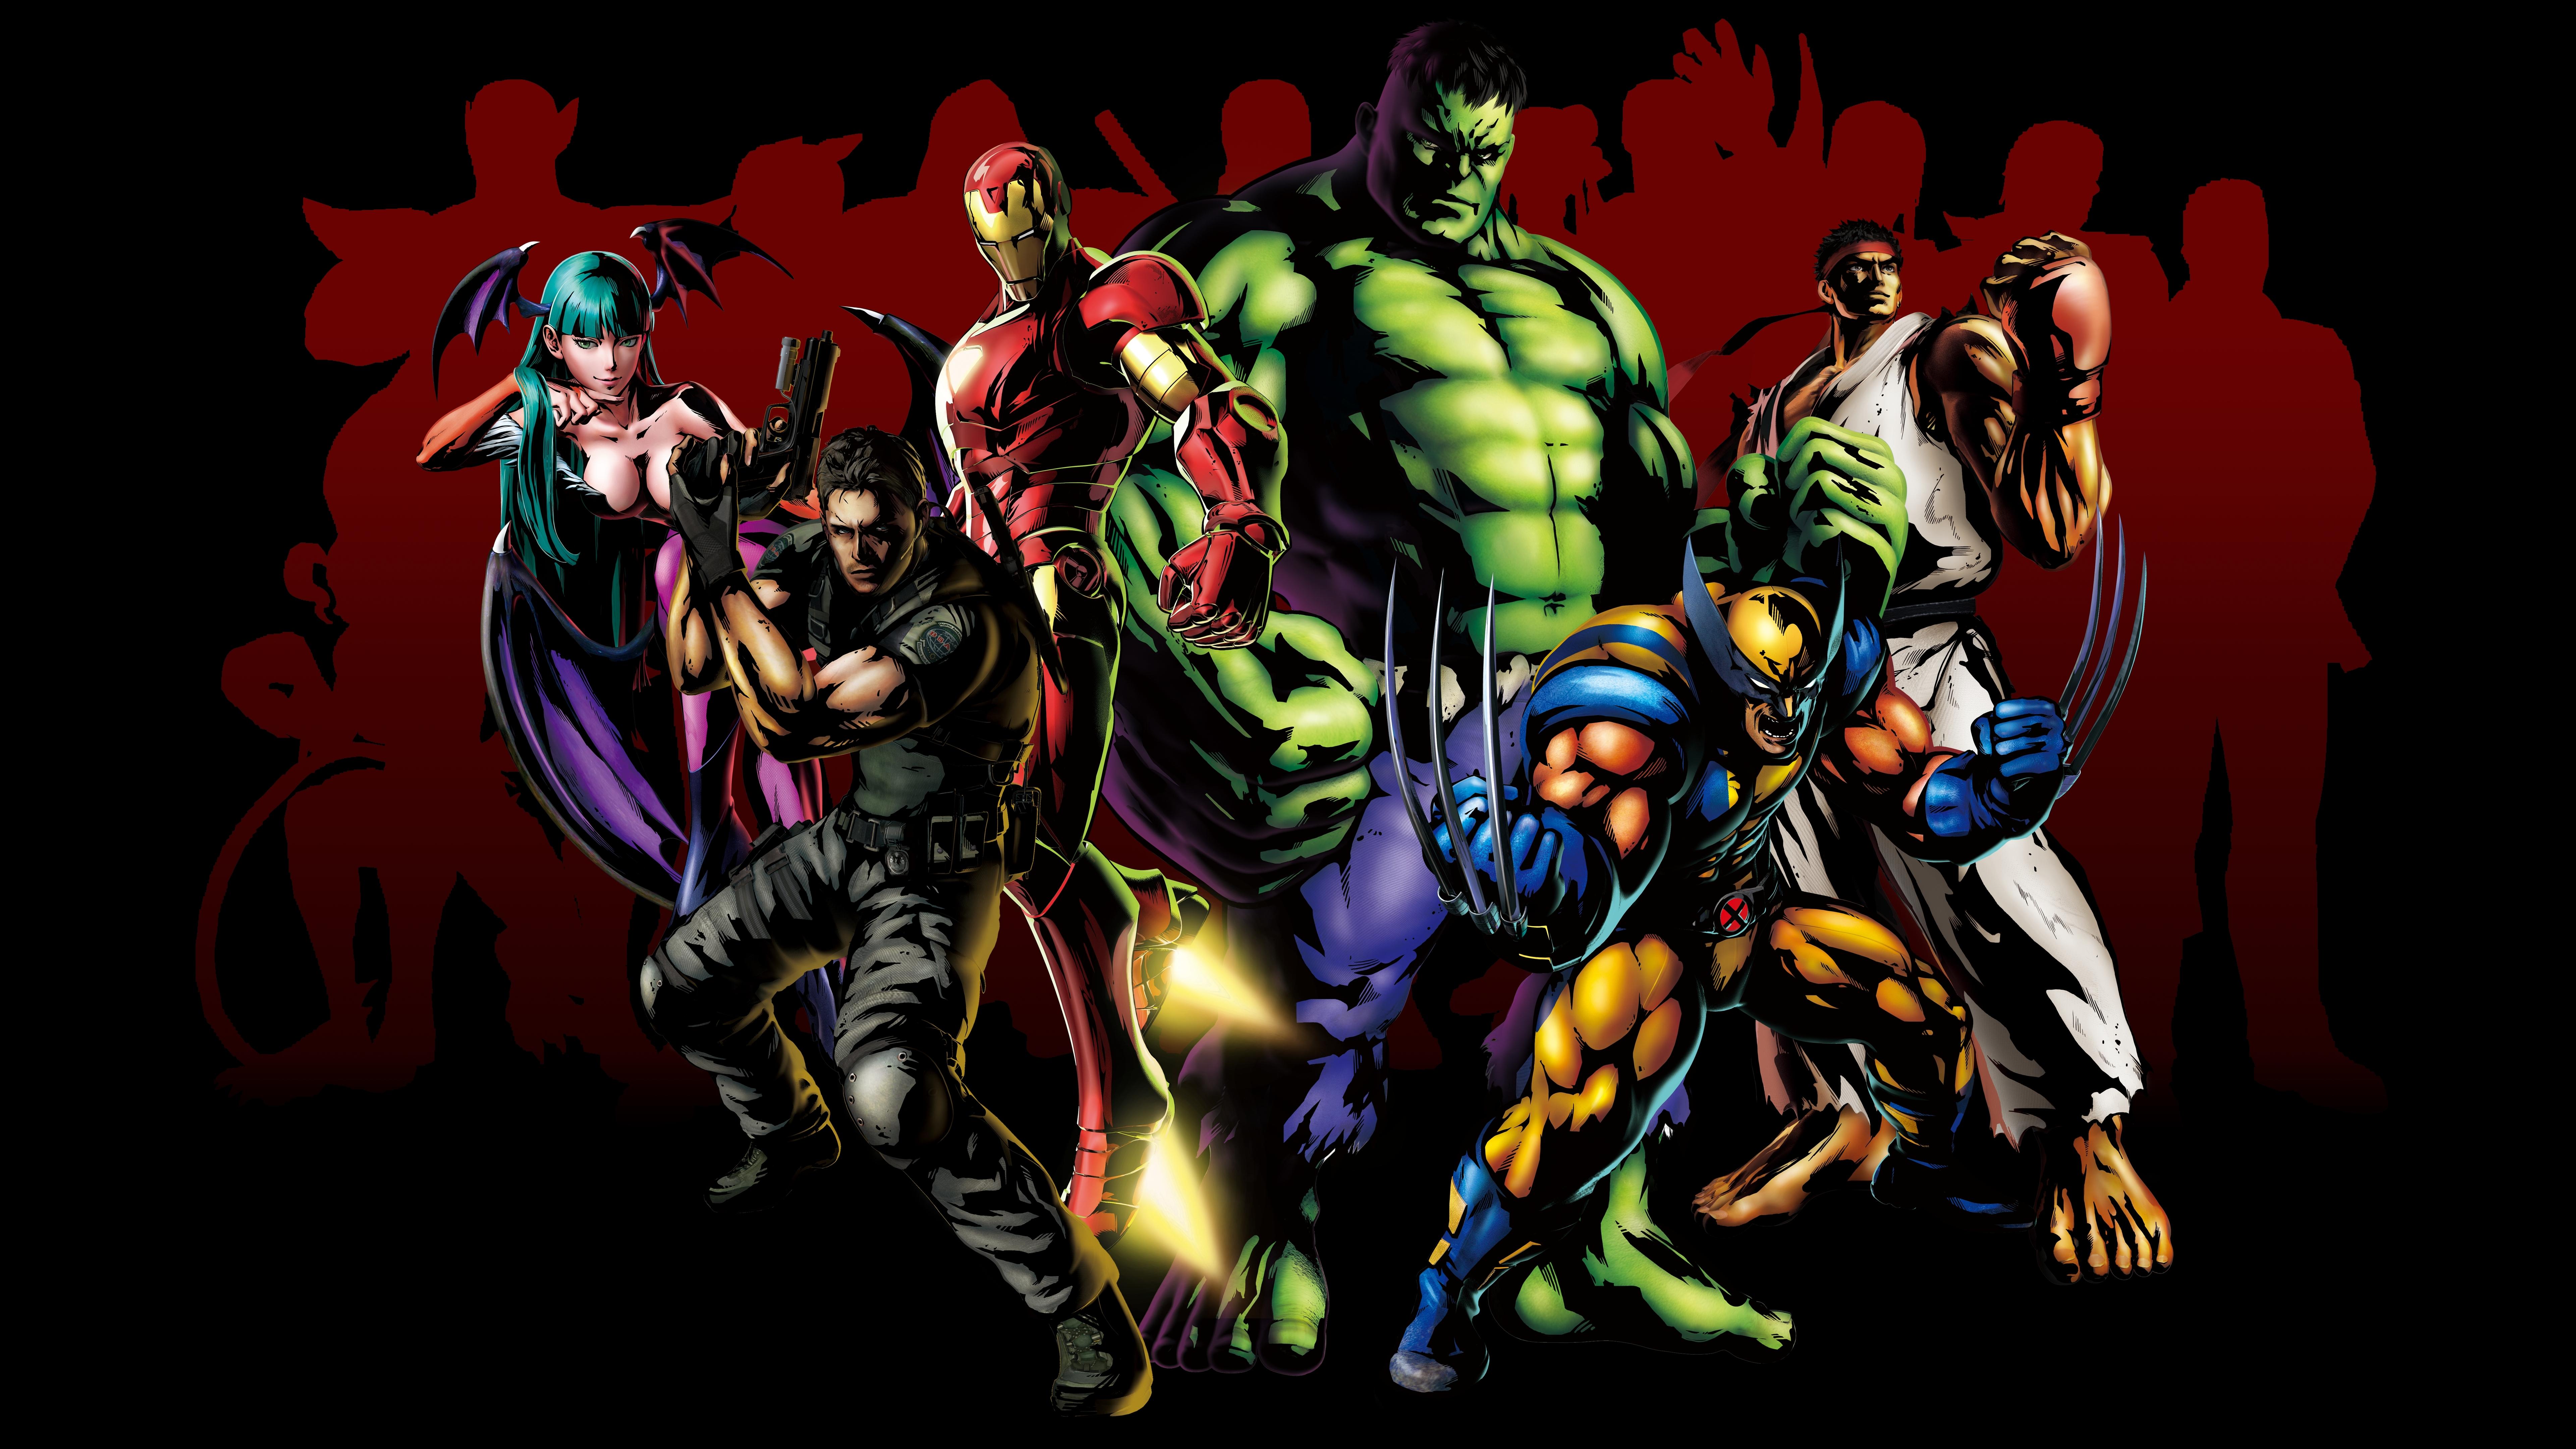 7680x4320 Marvel Vs Capcom 3 Fate Of Two Worlds 8k Hd 4k